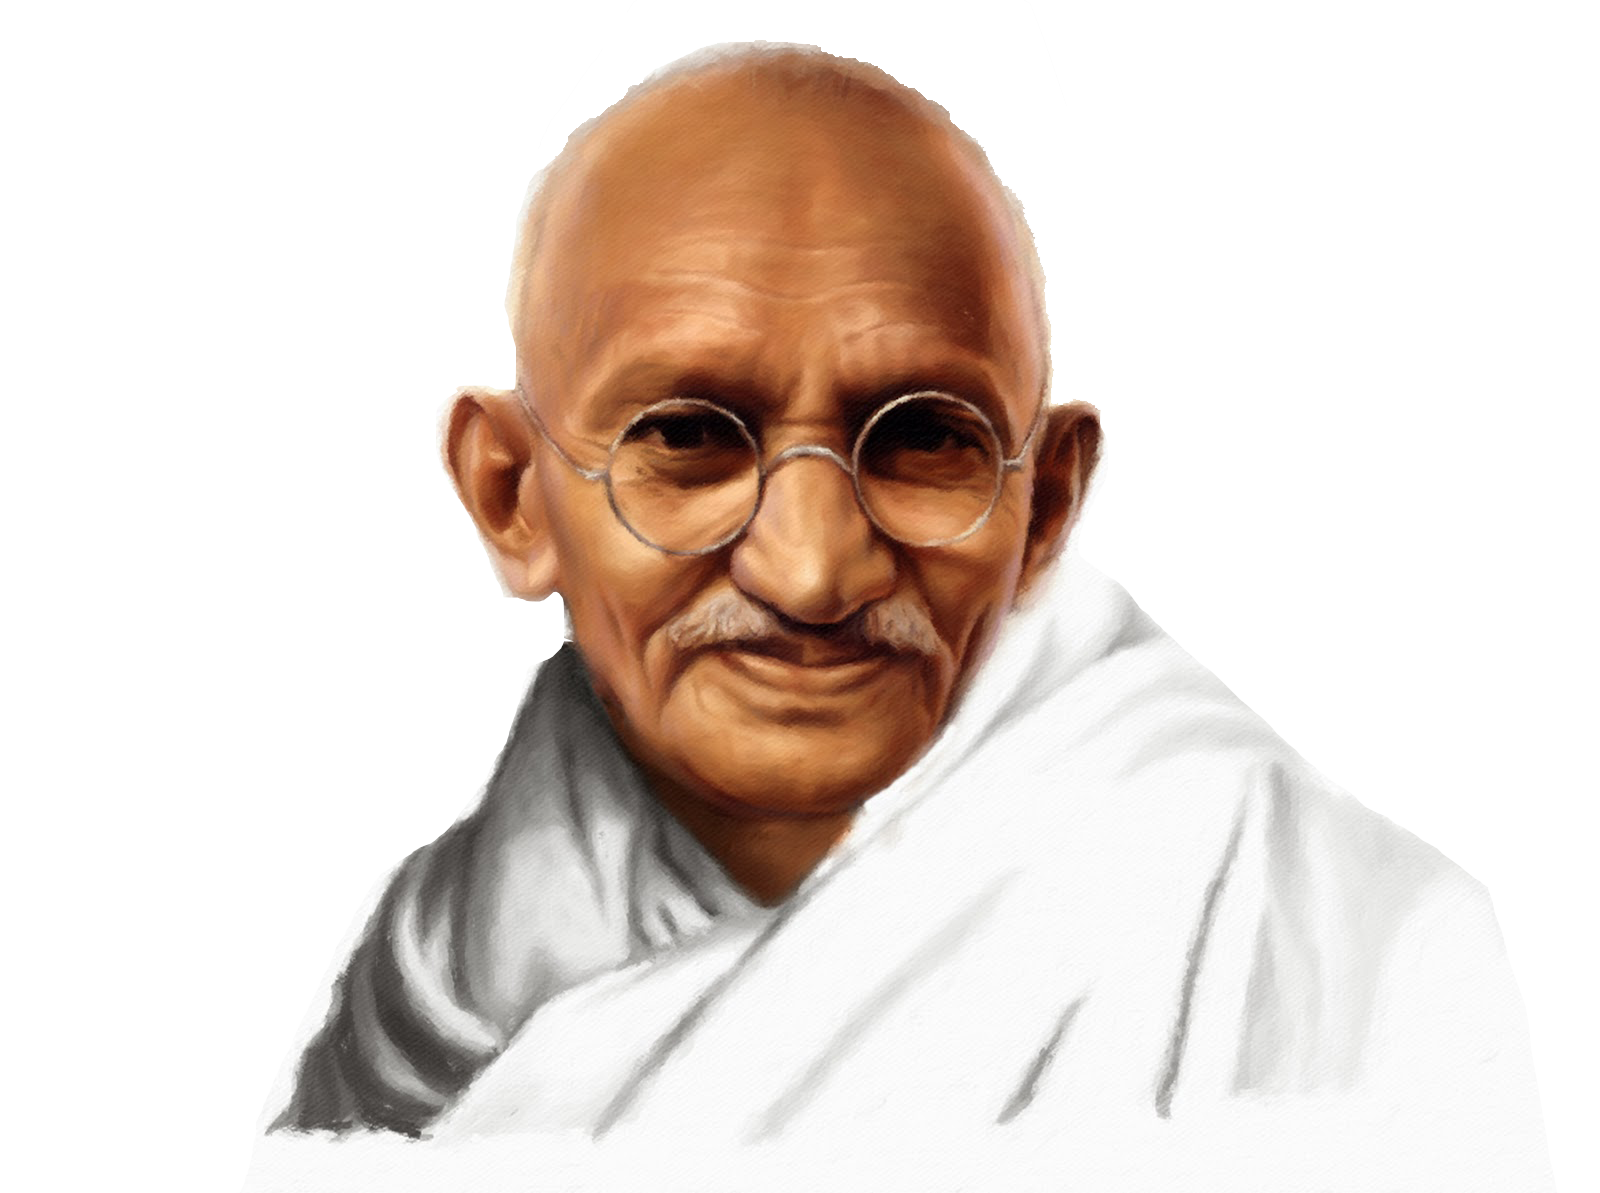 Mahatma Gandi: Nema puta ka miru, mir je put